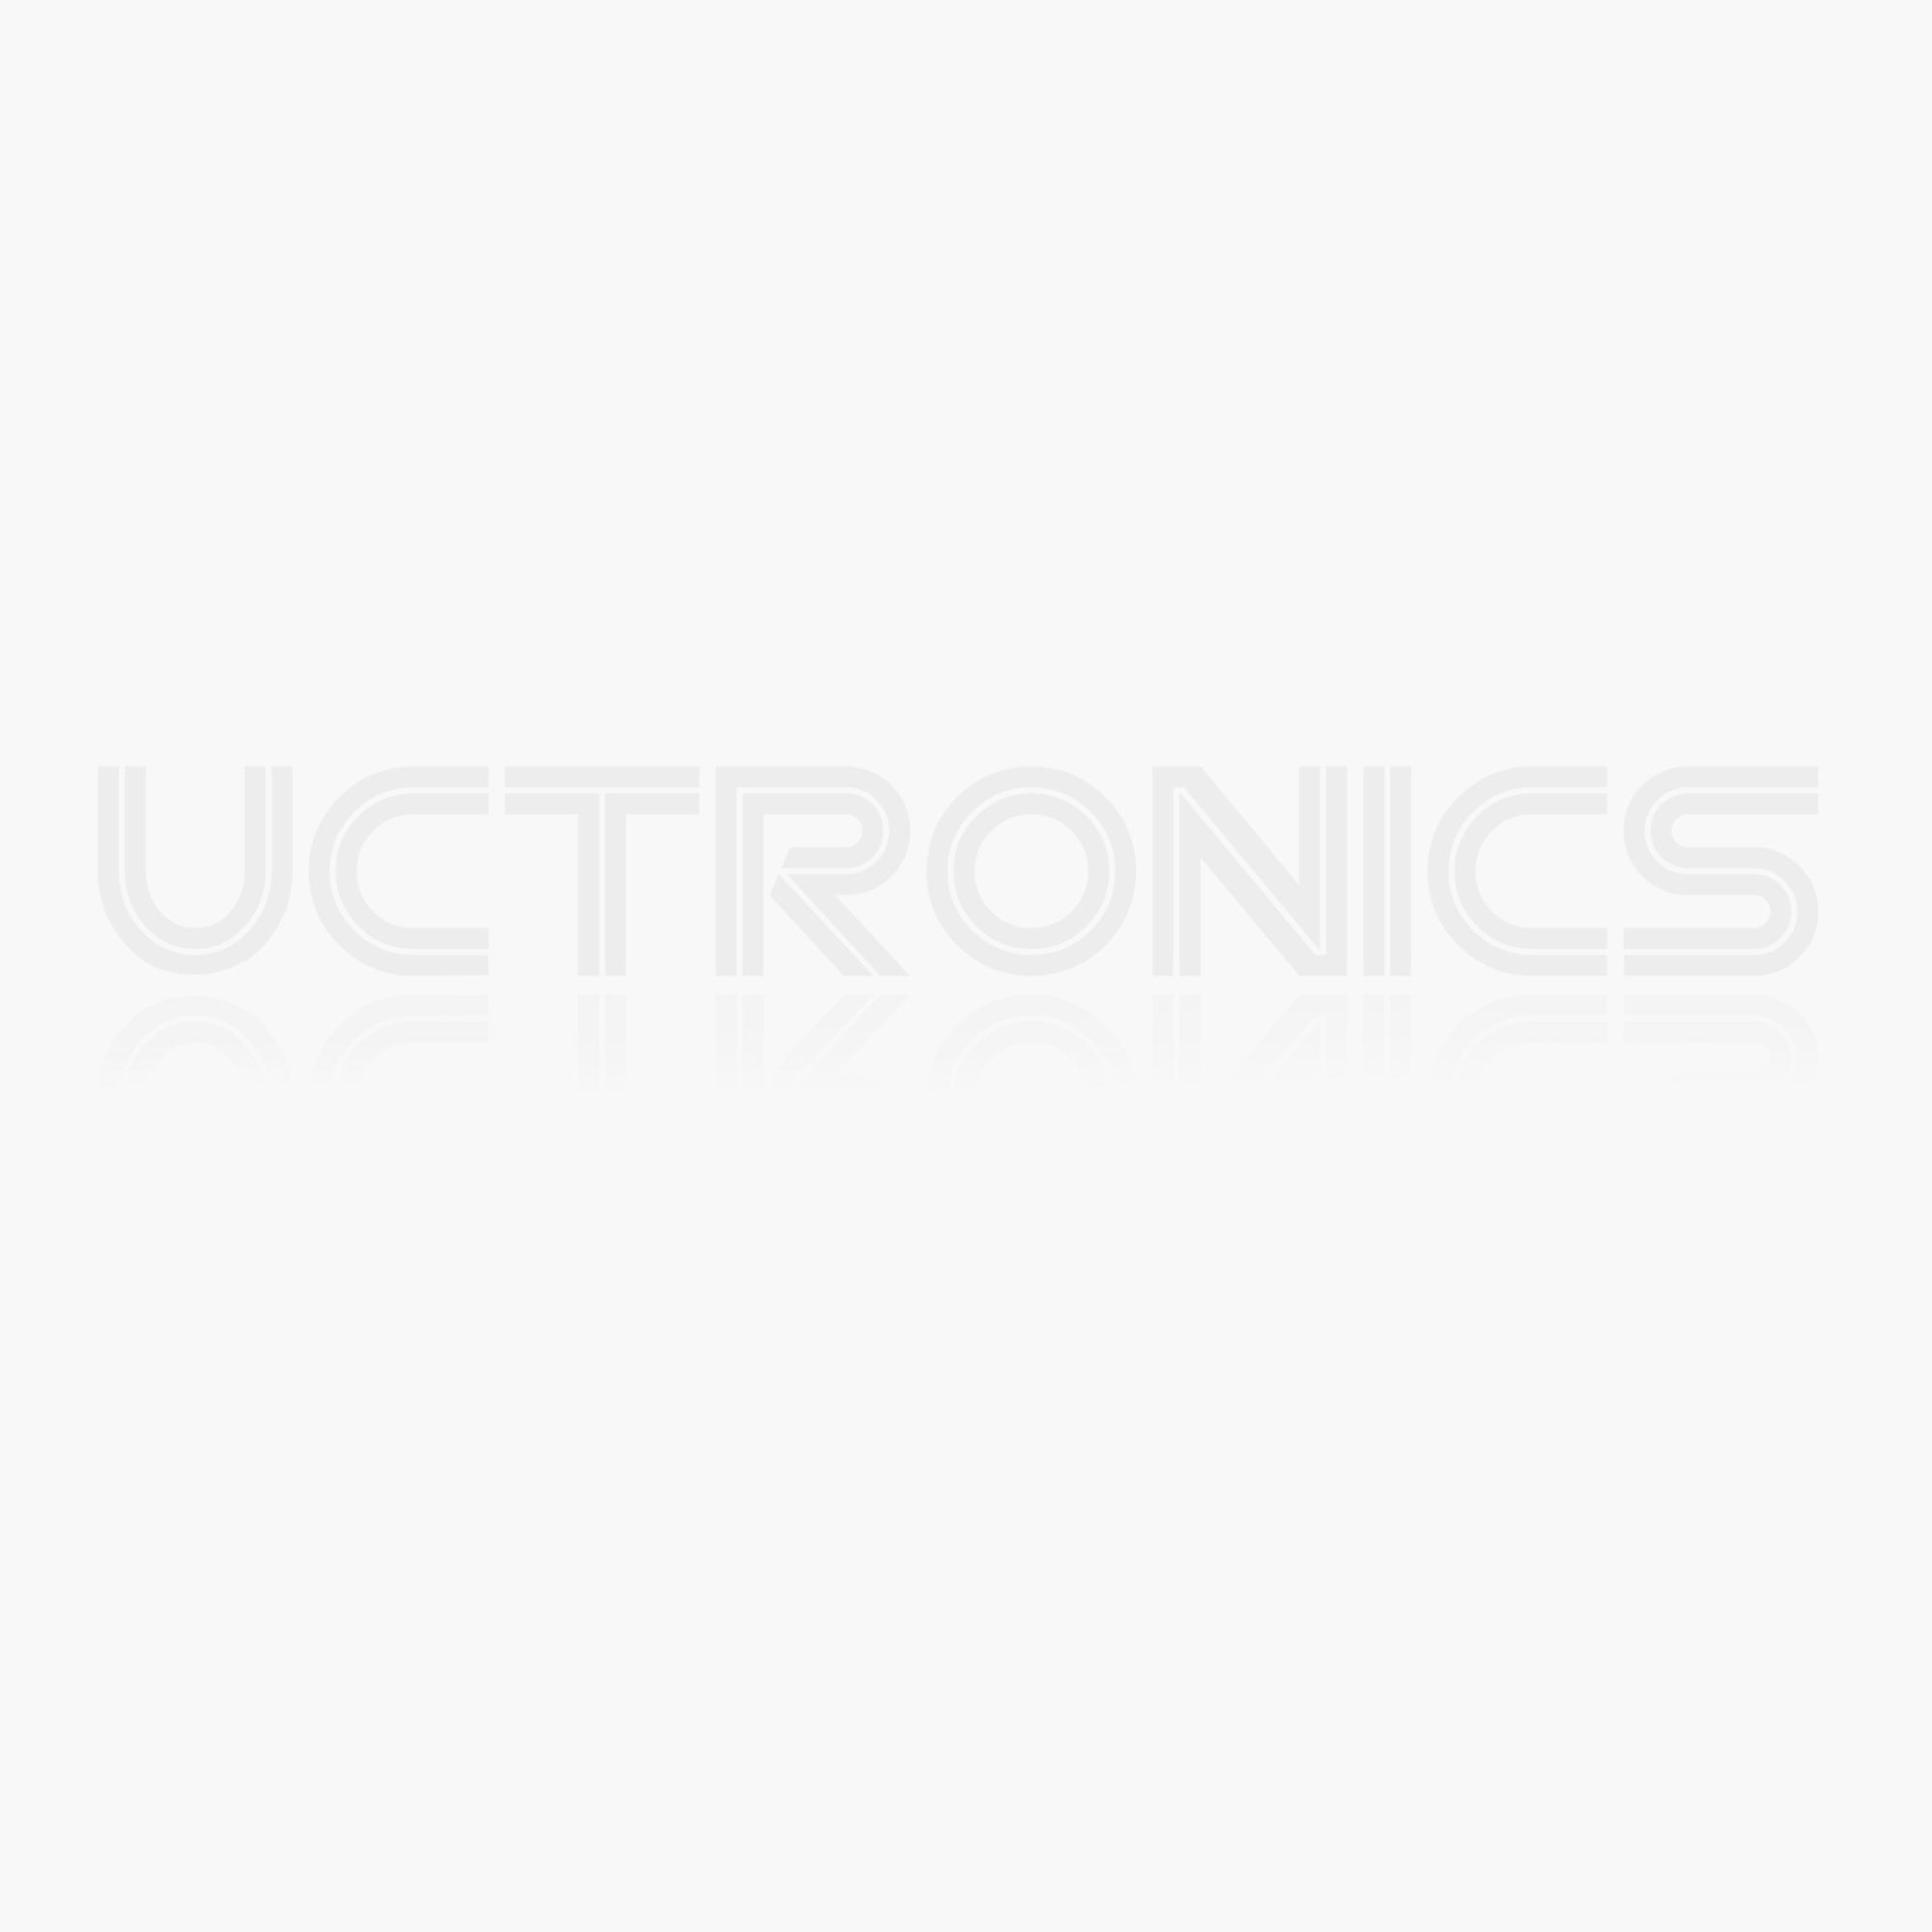 100pcs TO-3P Silicon Rubber Pad Insulation Chip Heatsink Thermal insulator